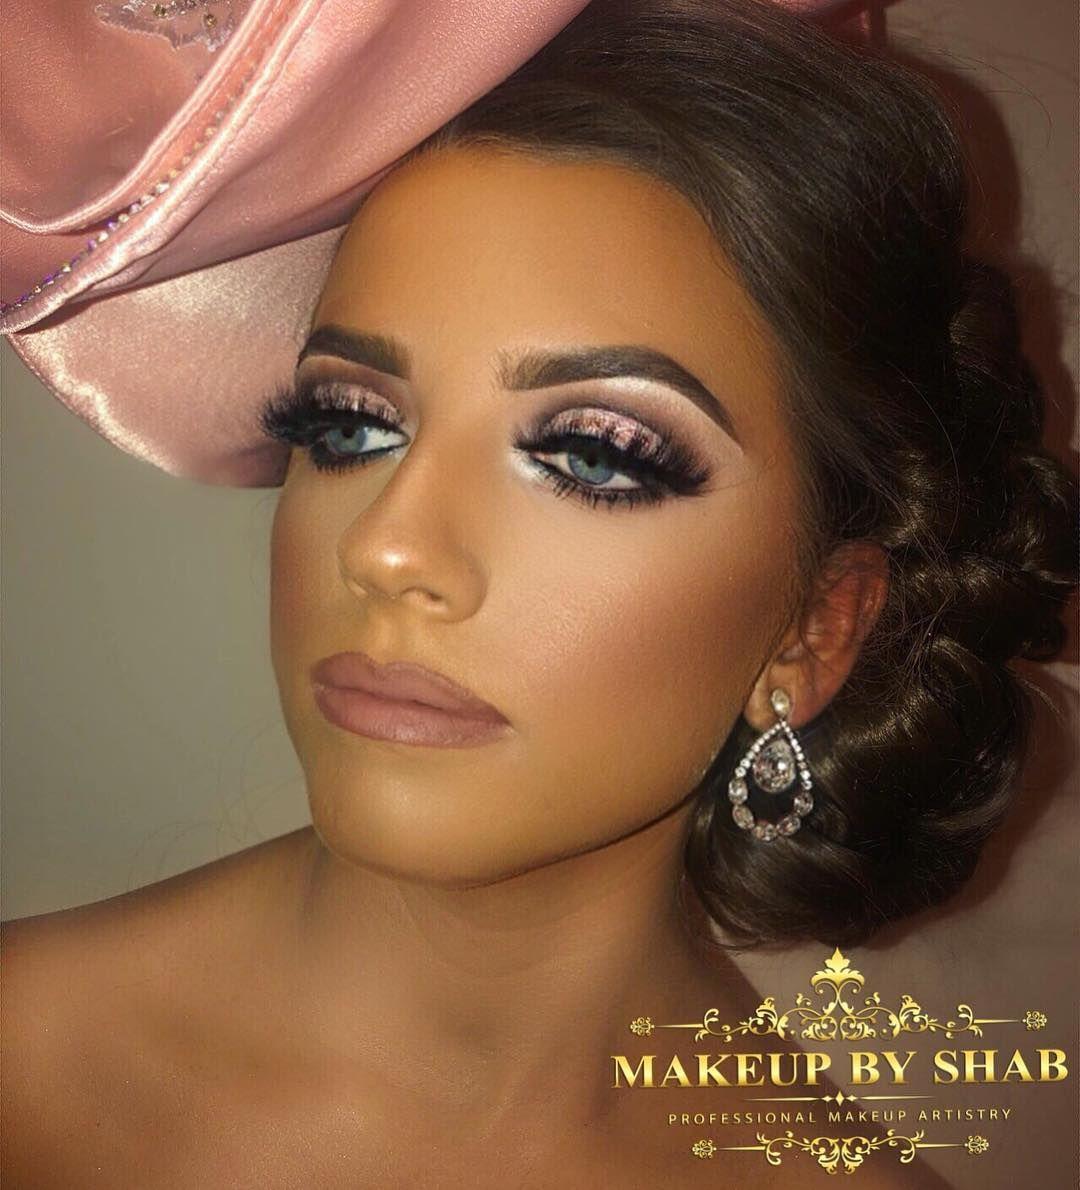 Makeup Artist Makeup By Shab On Instagram How Stunning Is She Makeup Artist Makeup Inspiration Makeup